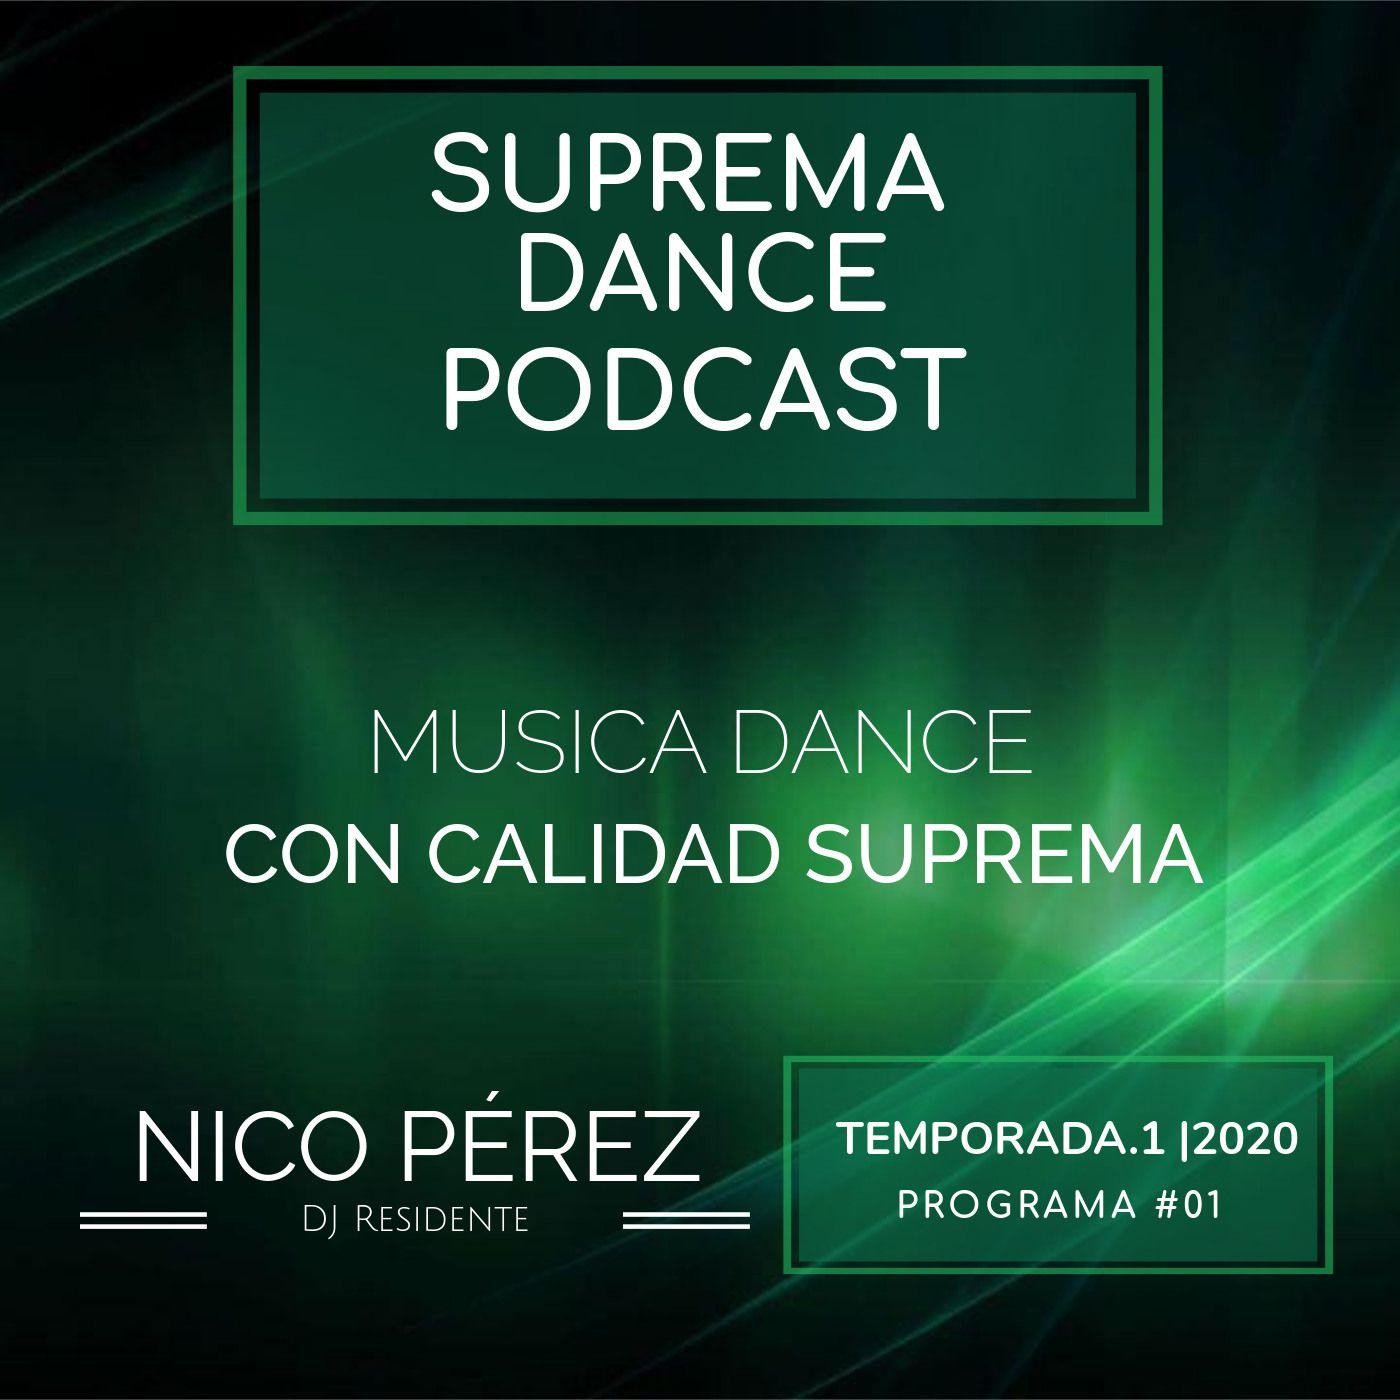 DJ Residente Nico Perez | Programa-1 | T.1 | SDP